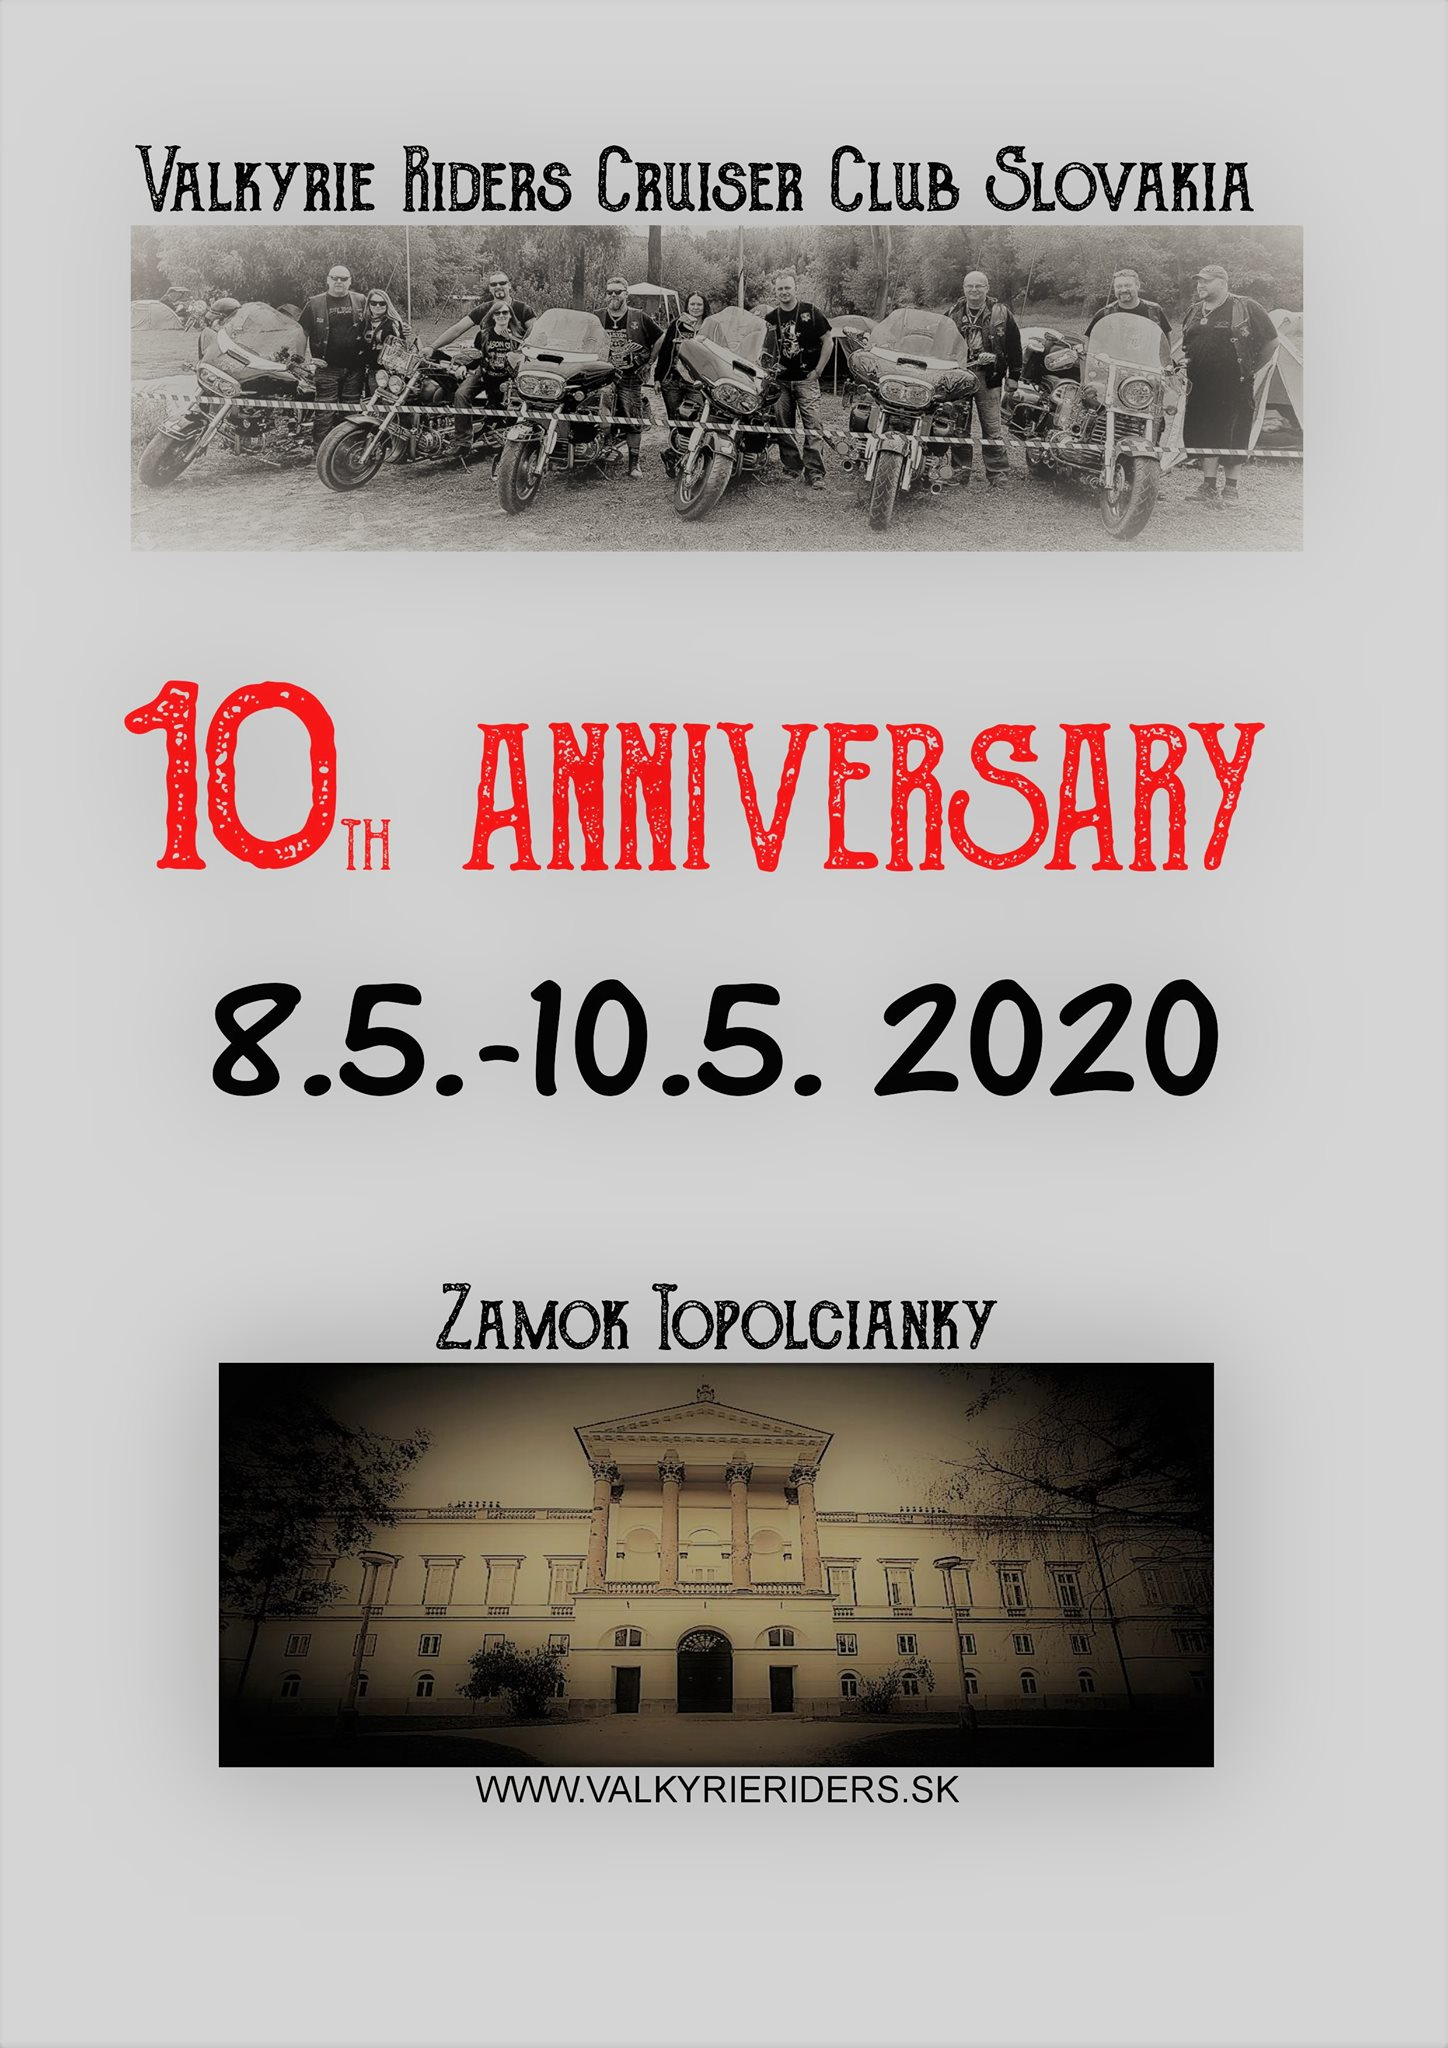 VRCCSlovakia_SO2010+10Ani.jpg